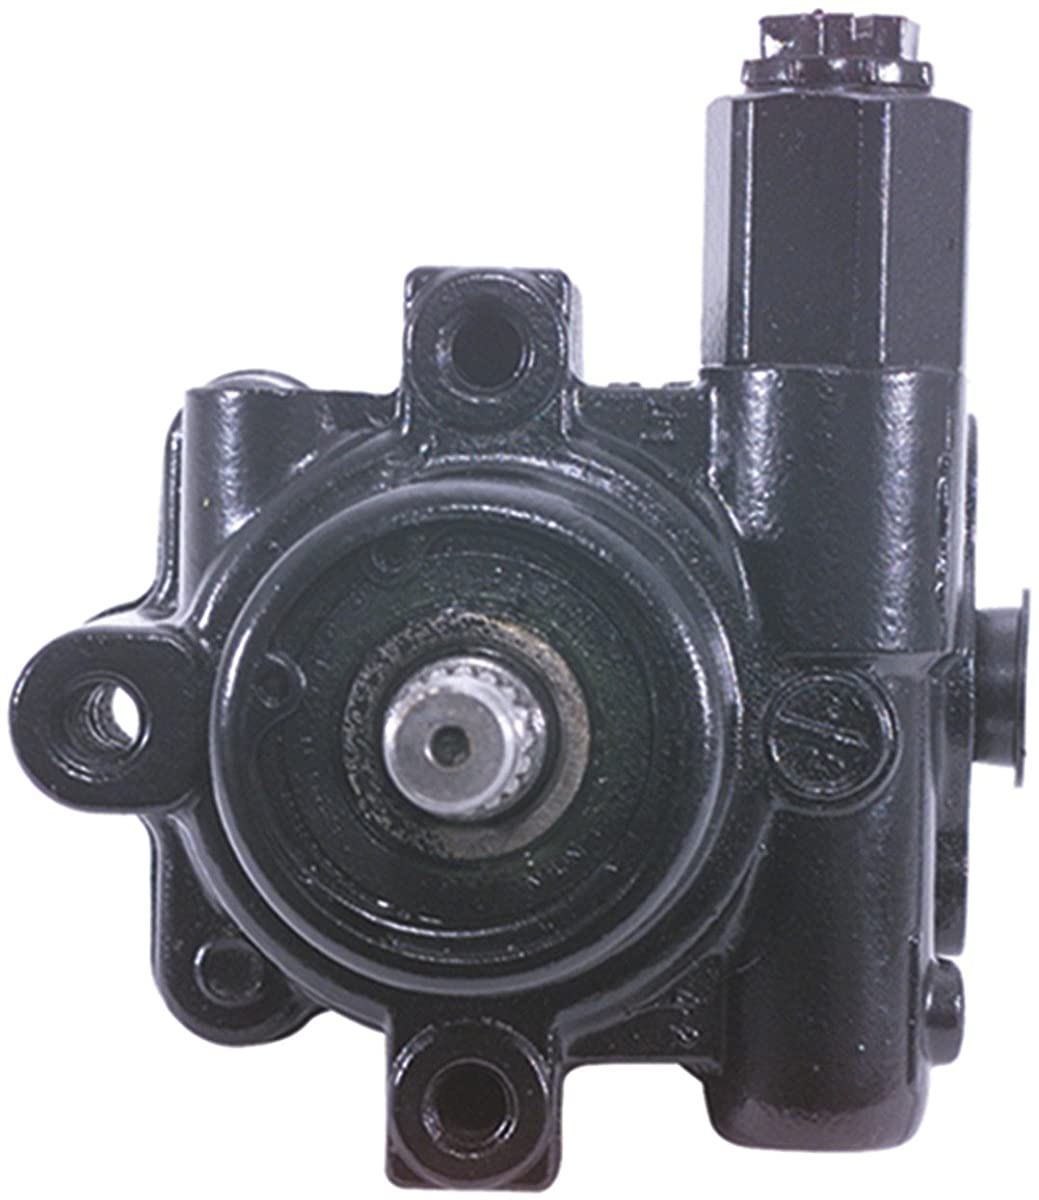 Cardone 21-5028 Remanufactured Import Power Steering Pump